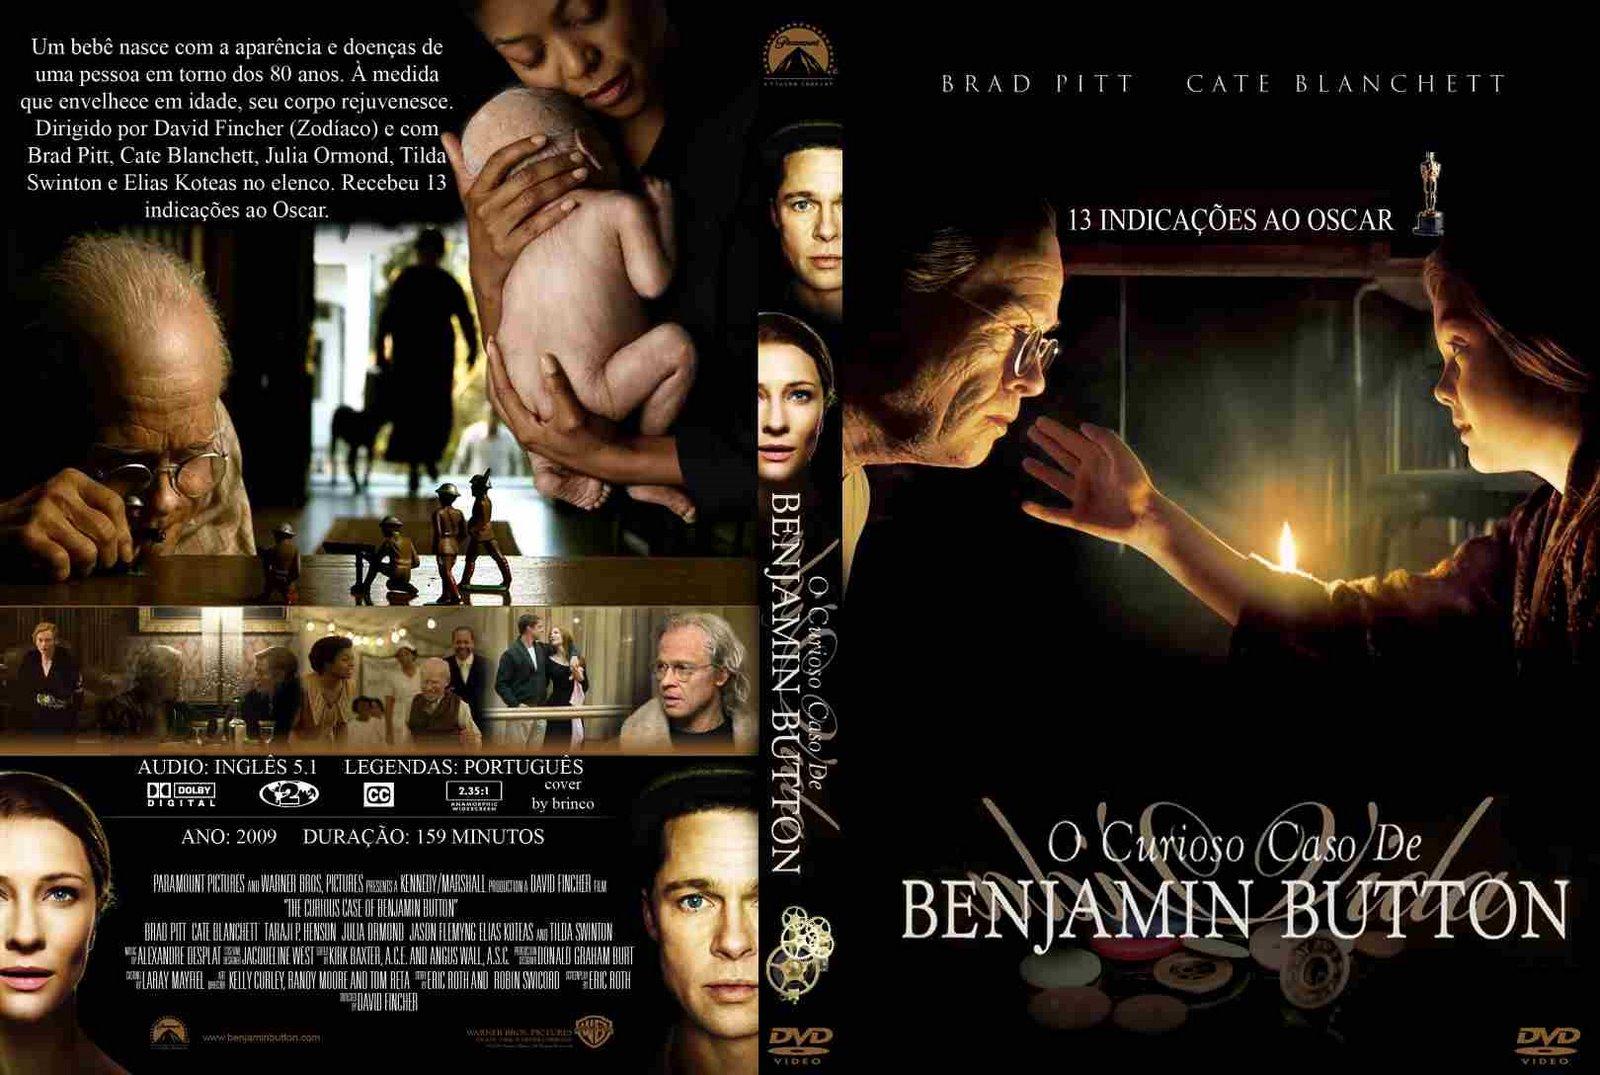 http://4.bp.blogspot.com/_TOMEetq86vI/TOW2oZeXpnI/AAAAAAAAARg/MnCHIjrmc8w/s1600/O+Curioso+Caso+De+Benjamin+Button.jpg